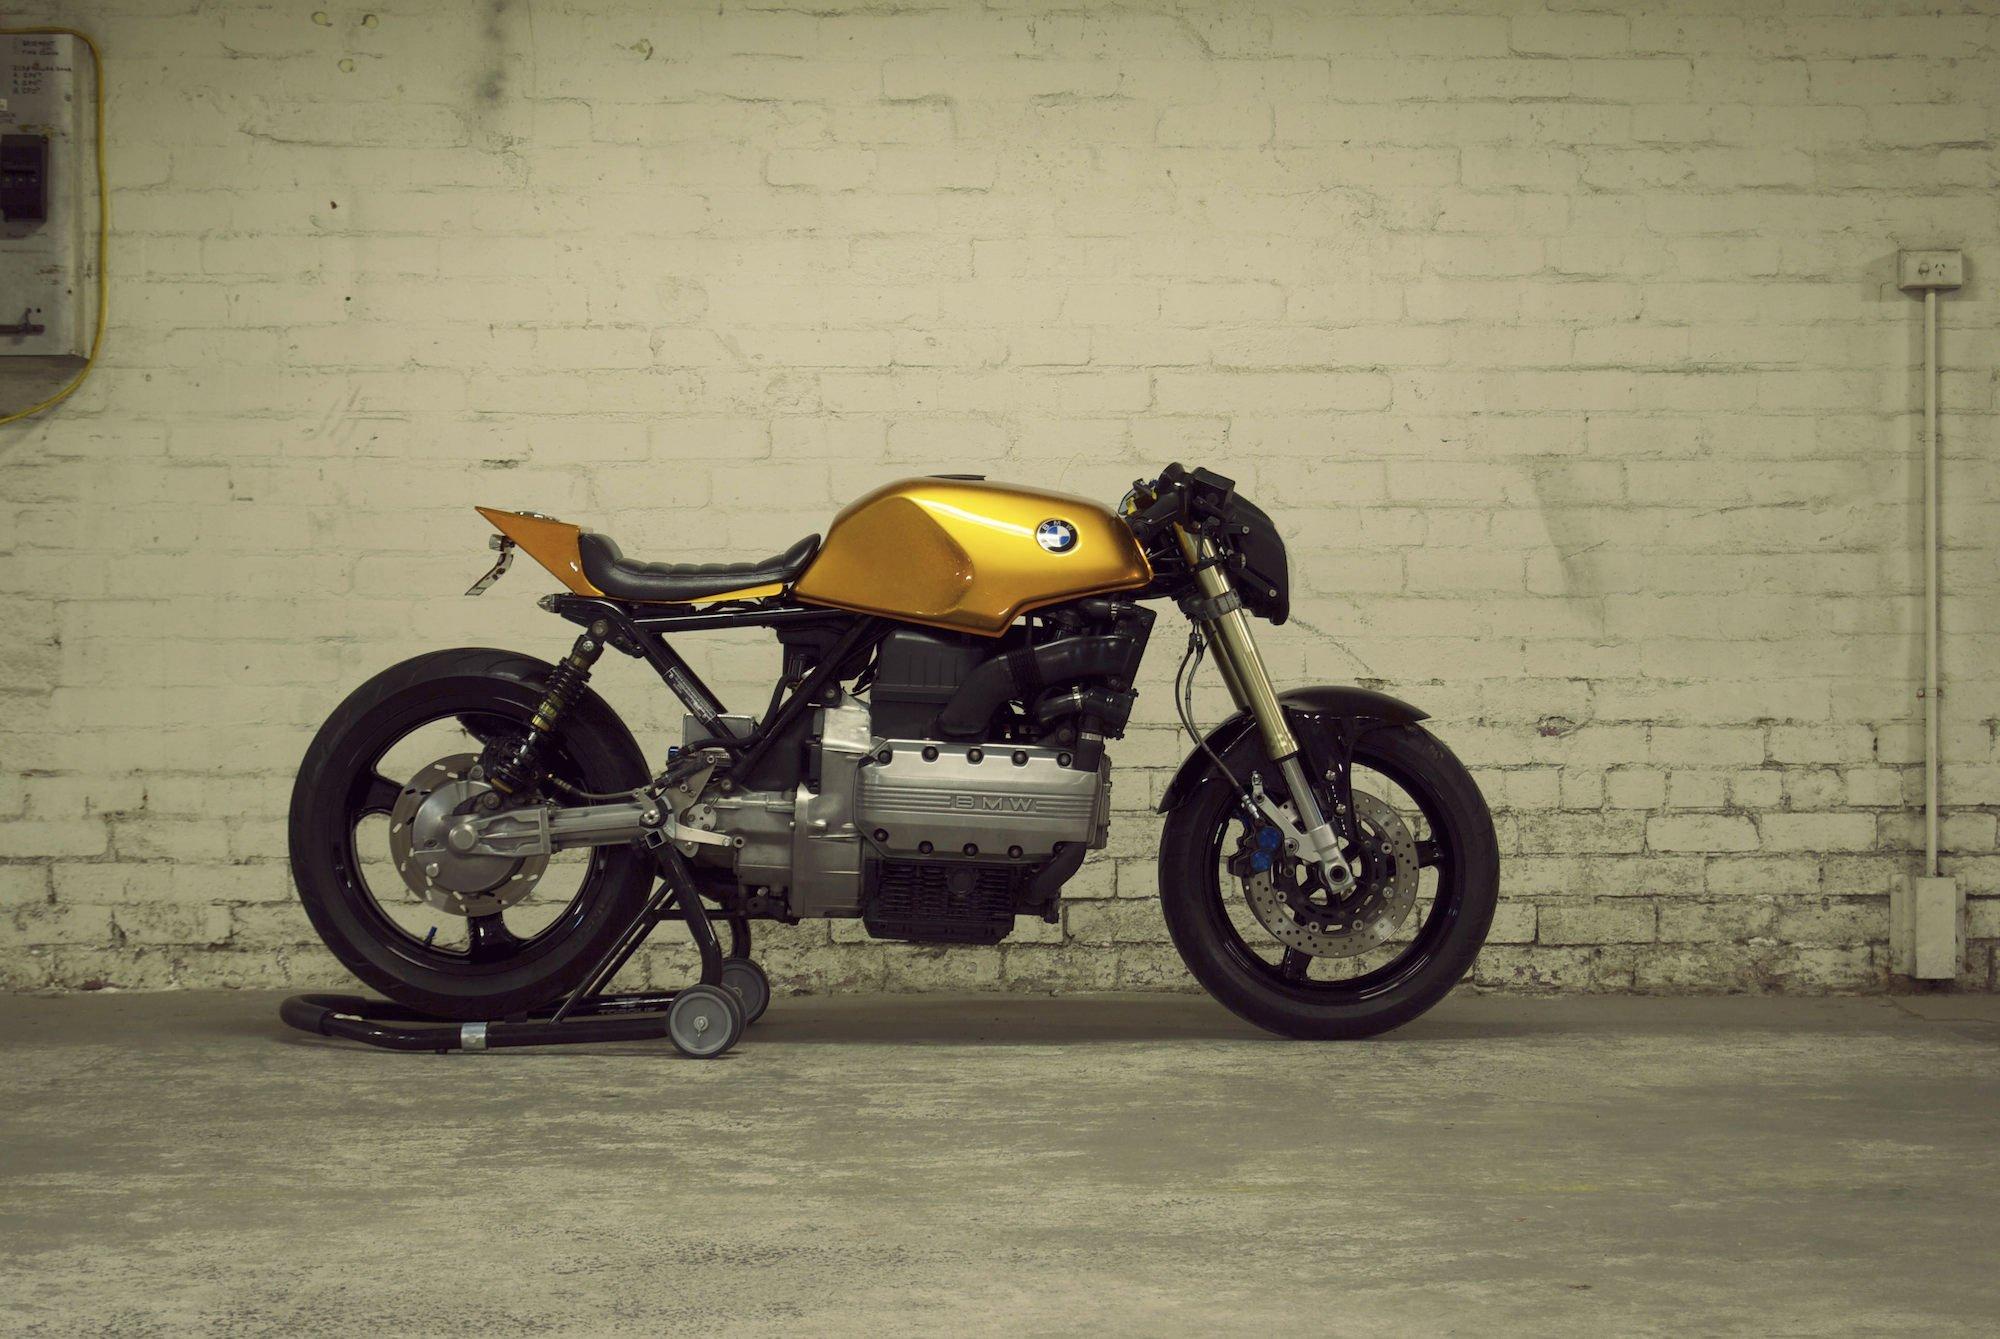 Bmw K100 Cafe Racer – Idea di immagine auto